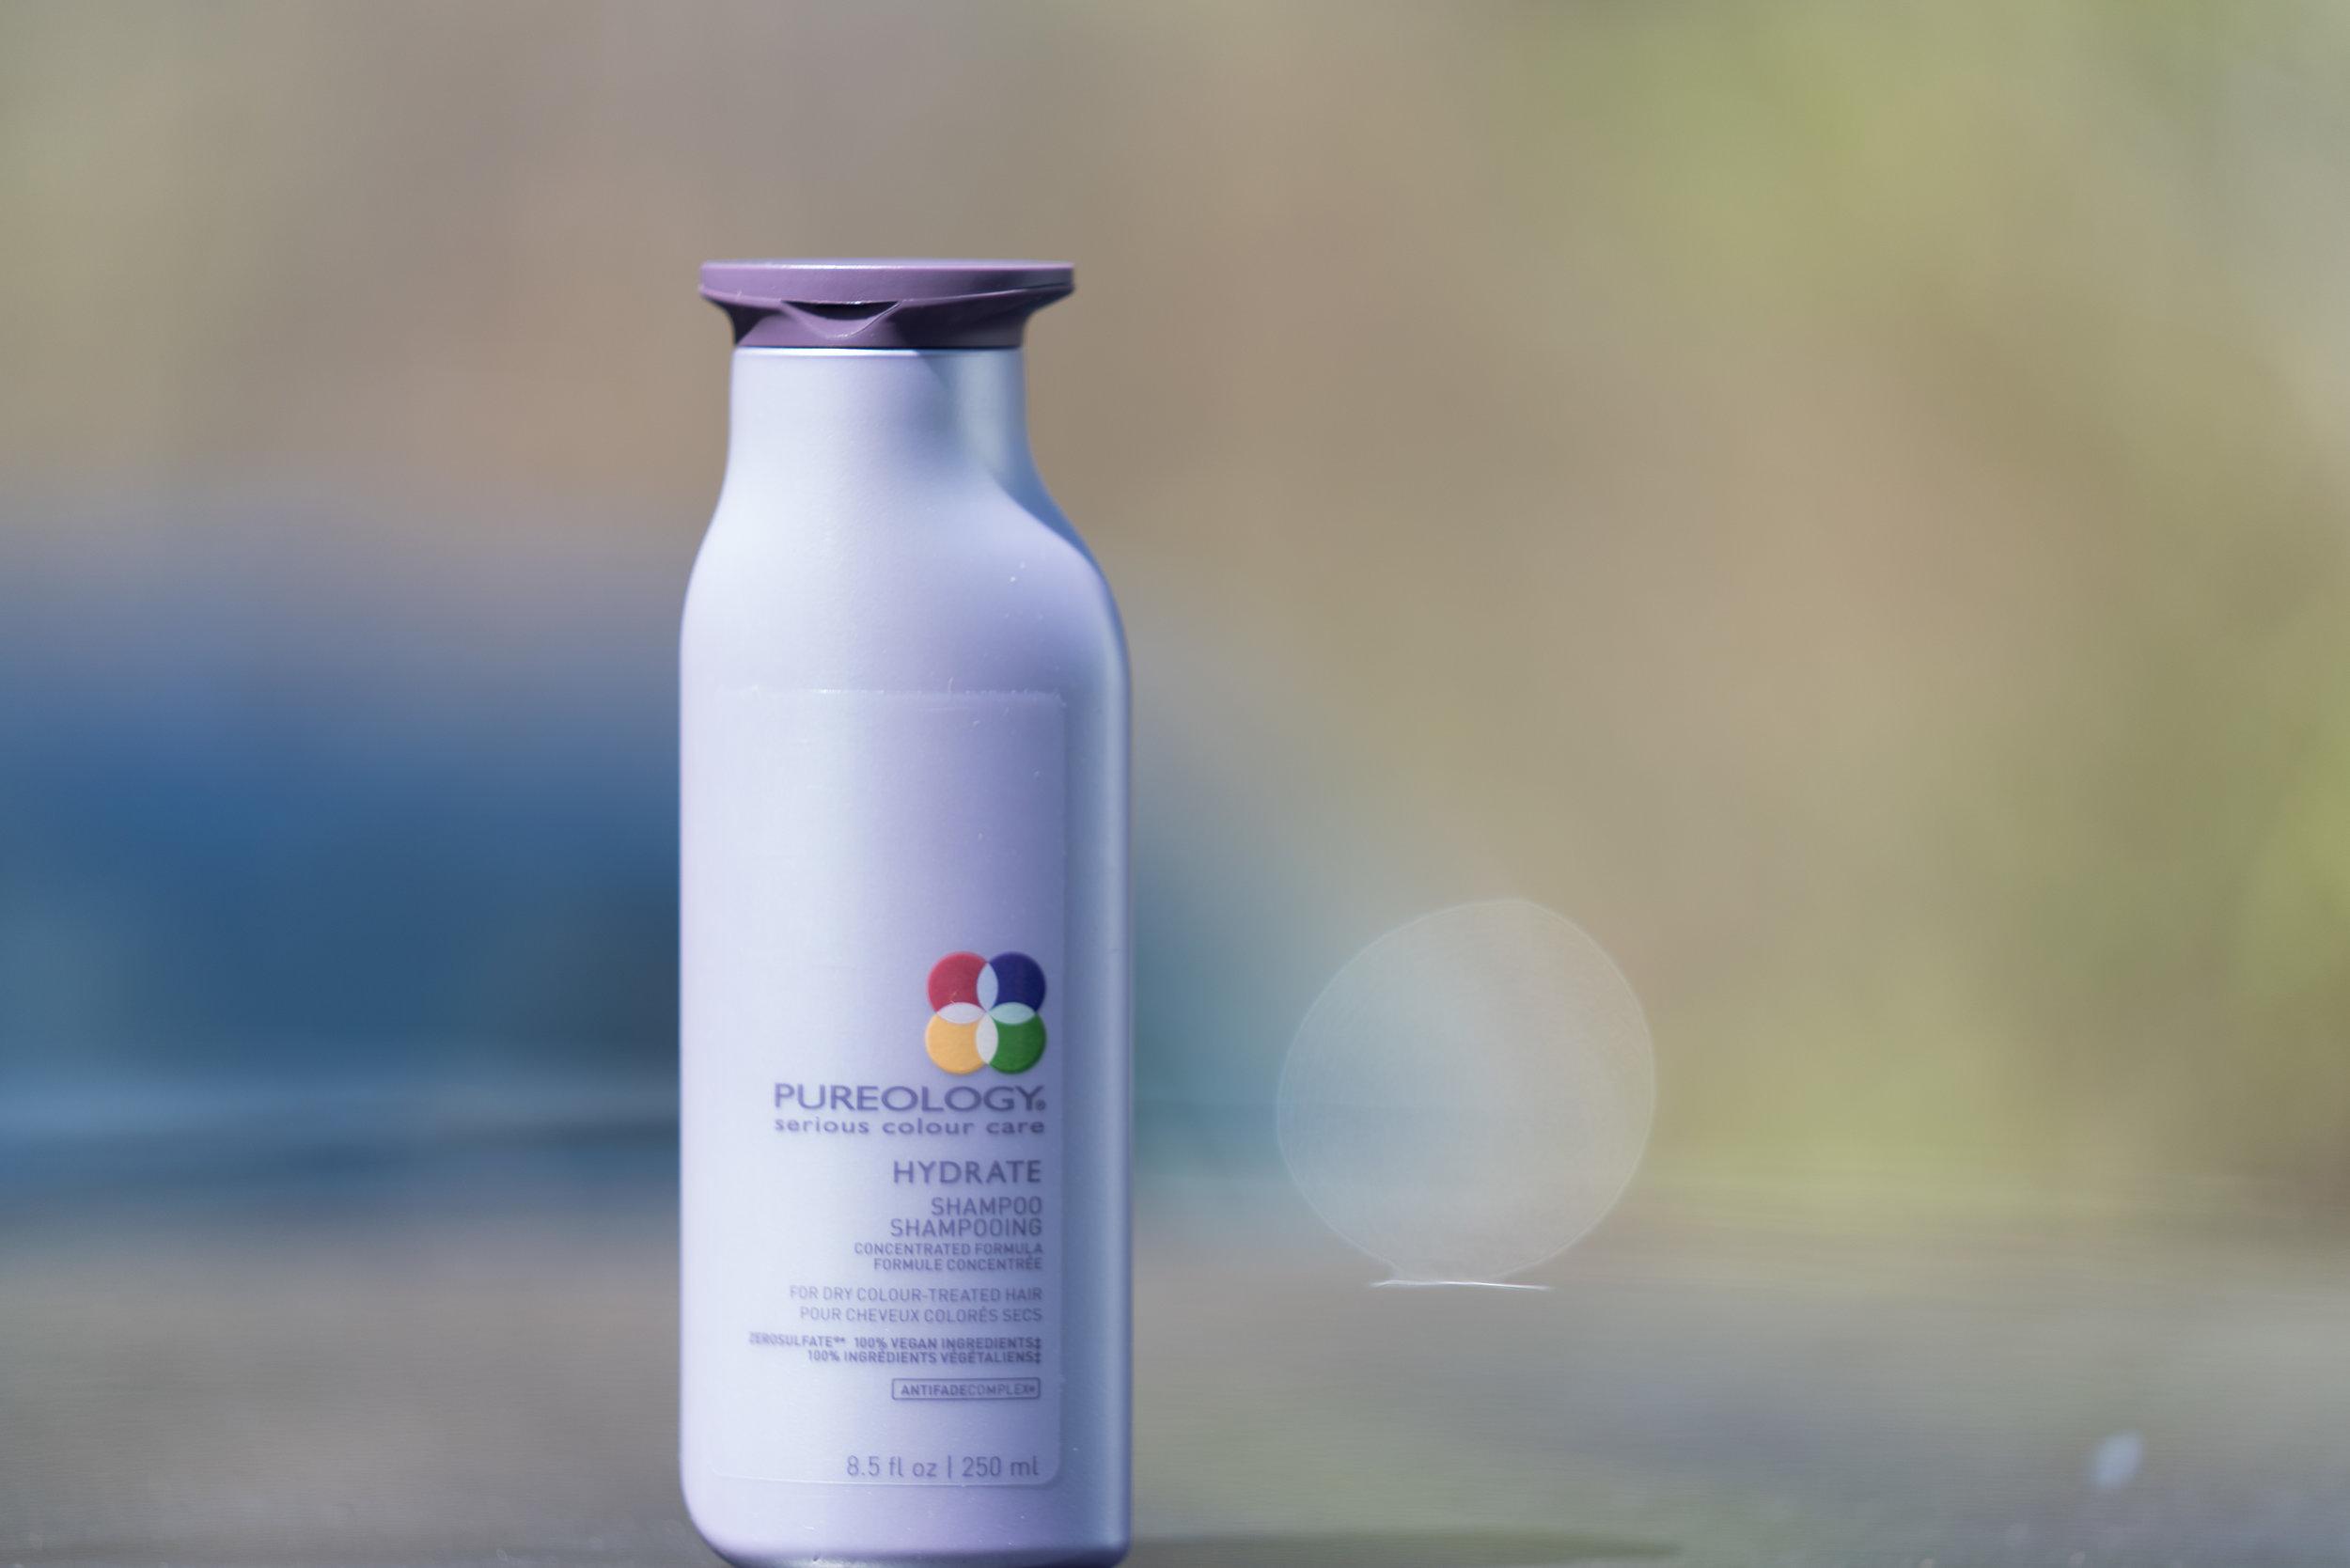 Pureology-Hydrate-Shampoo.jpg